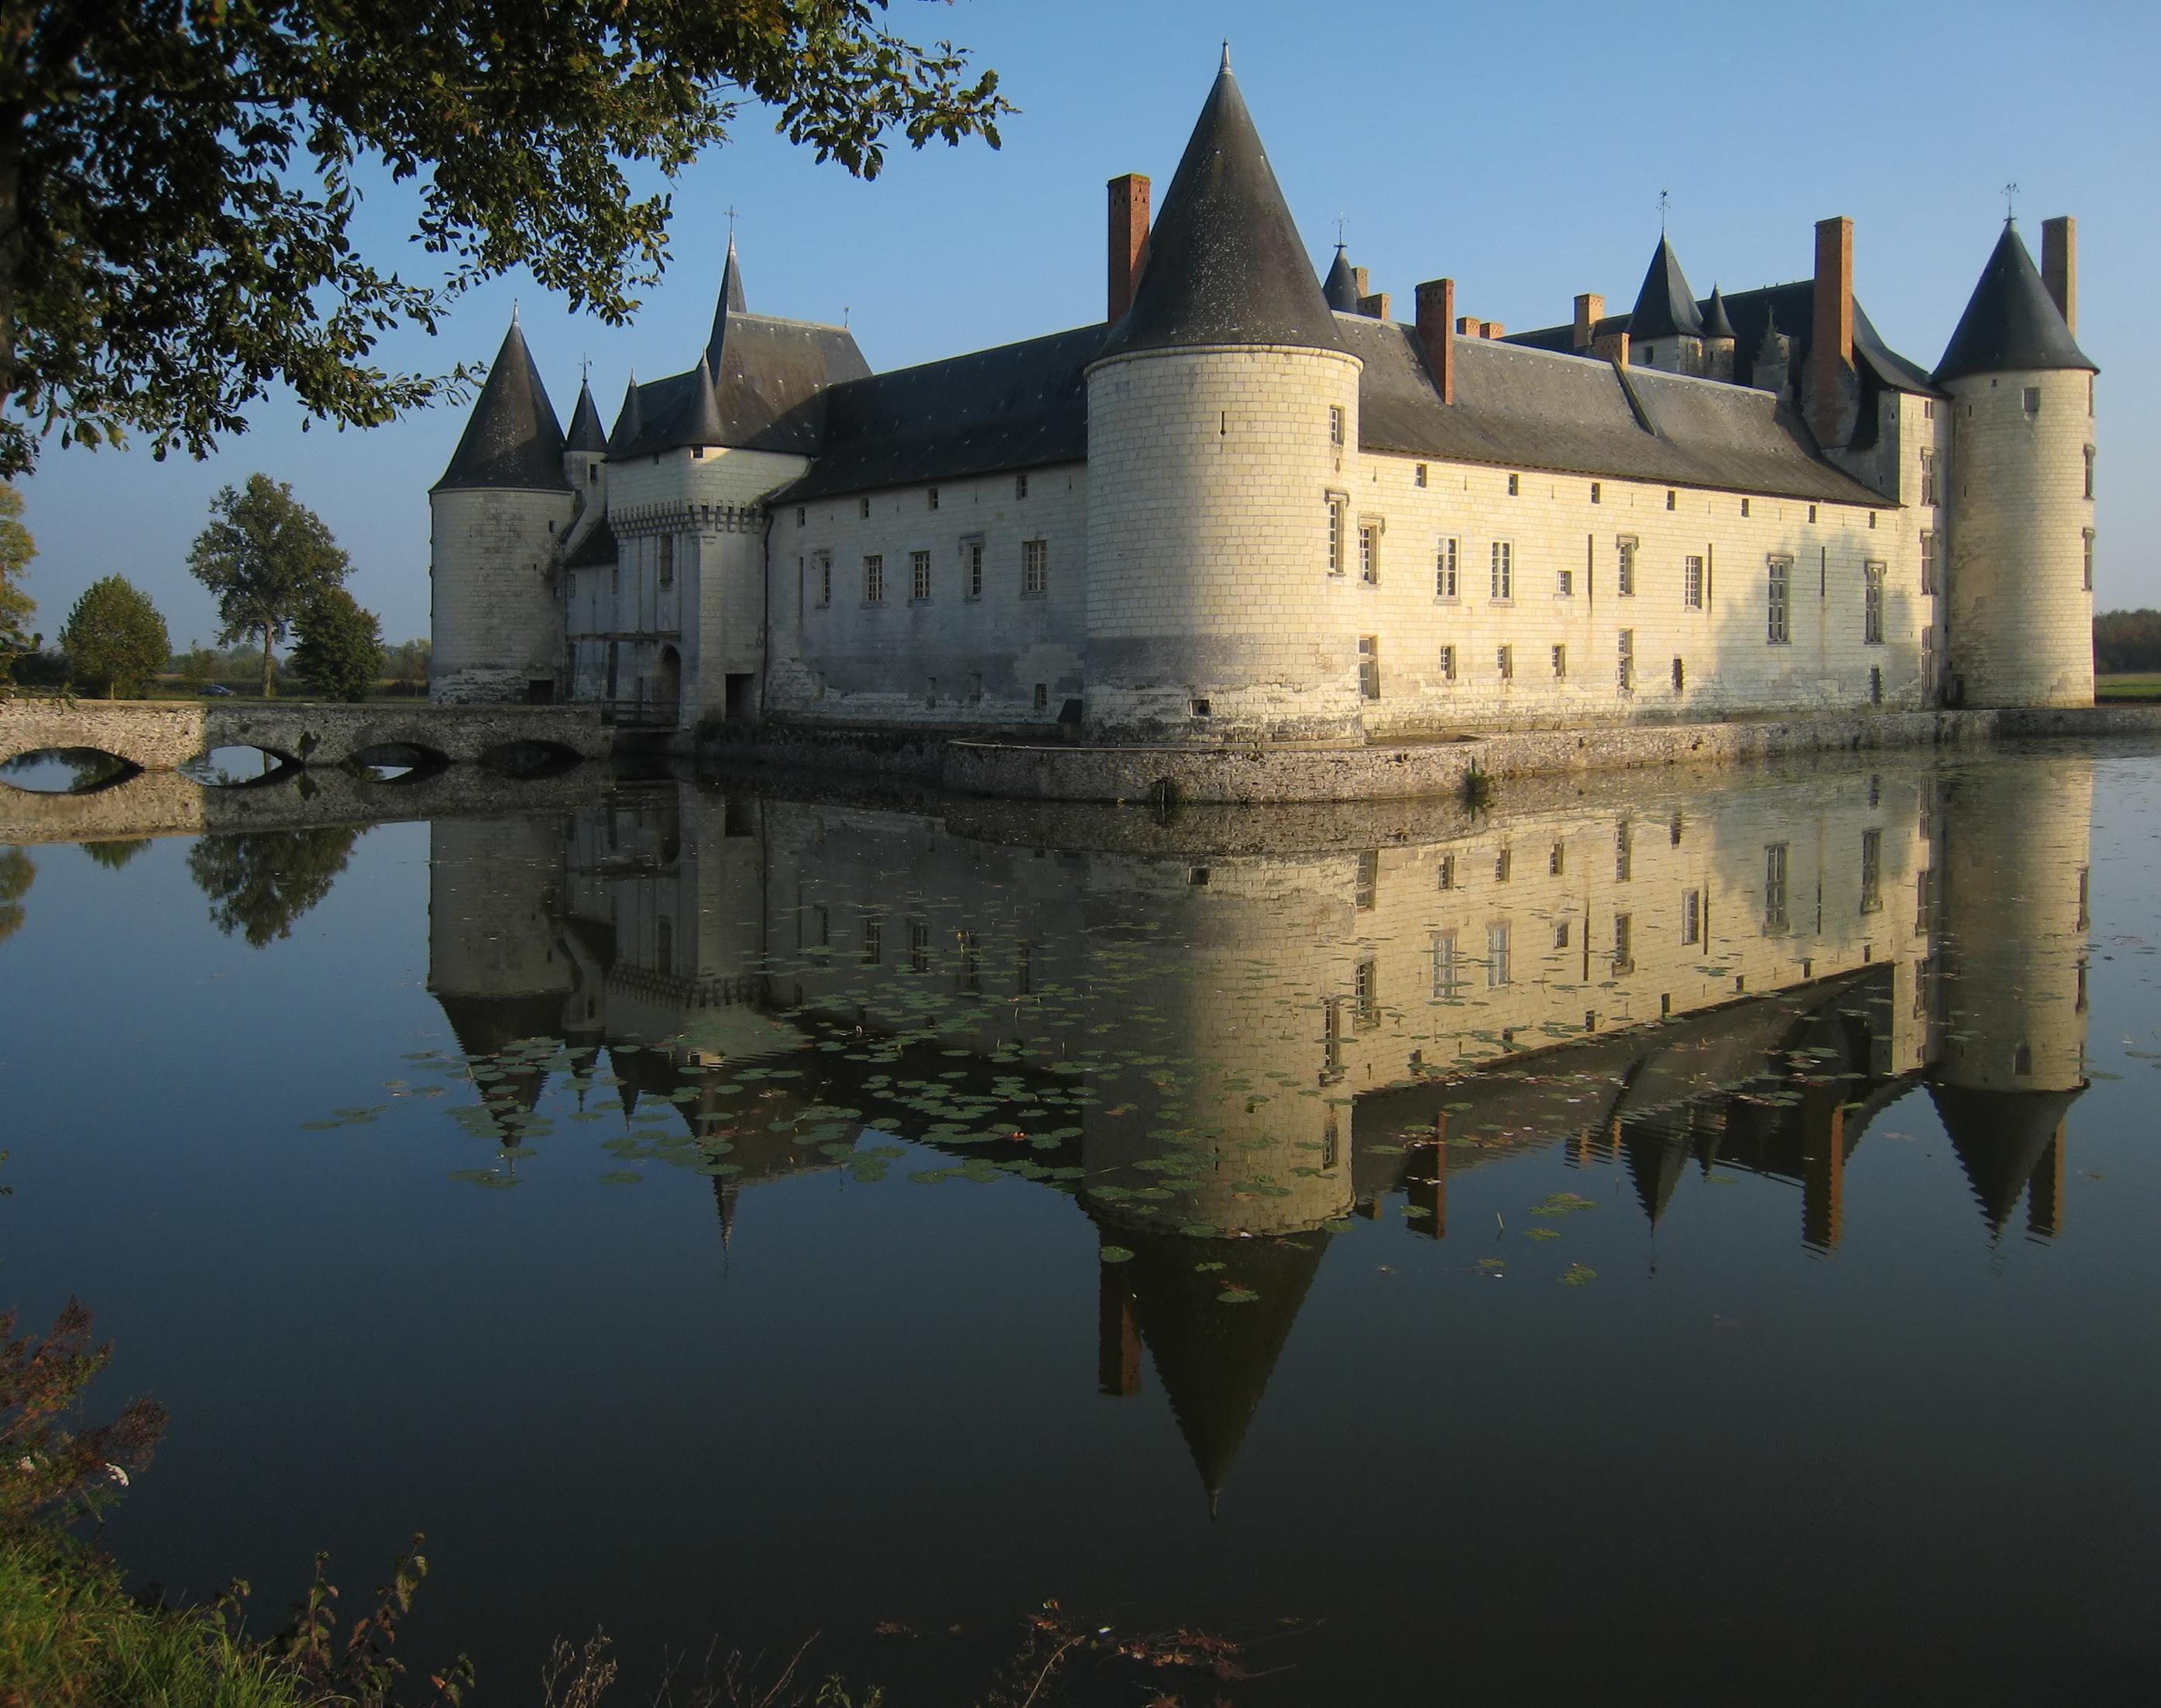 http://upload.wikimedia.org/wikipedia/commons/4/47/Castle_Plessis_Bourre_2007_02-denoised.jpg